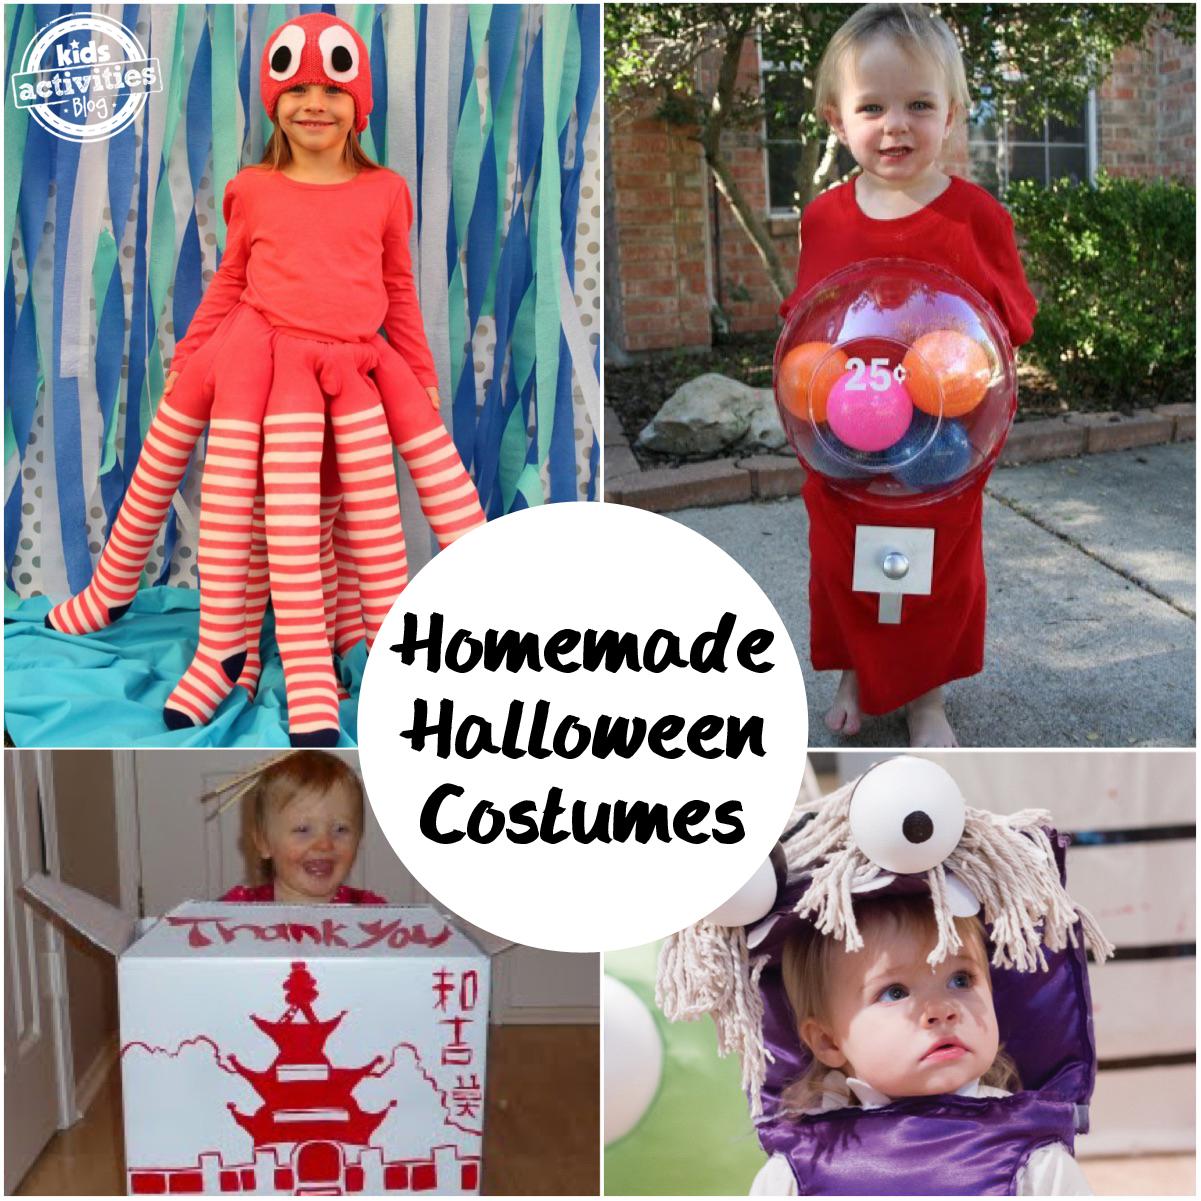 Halloween-Costumes-copy.jpg